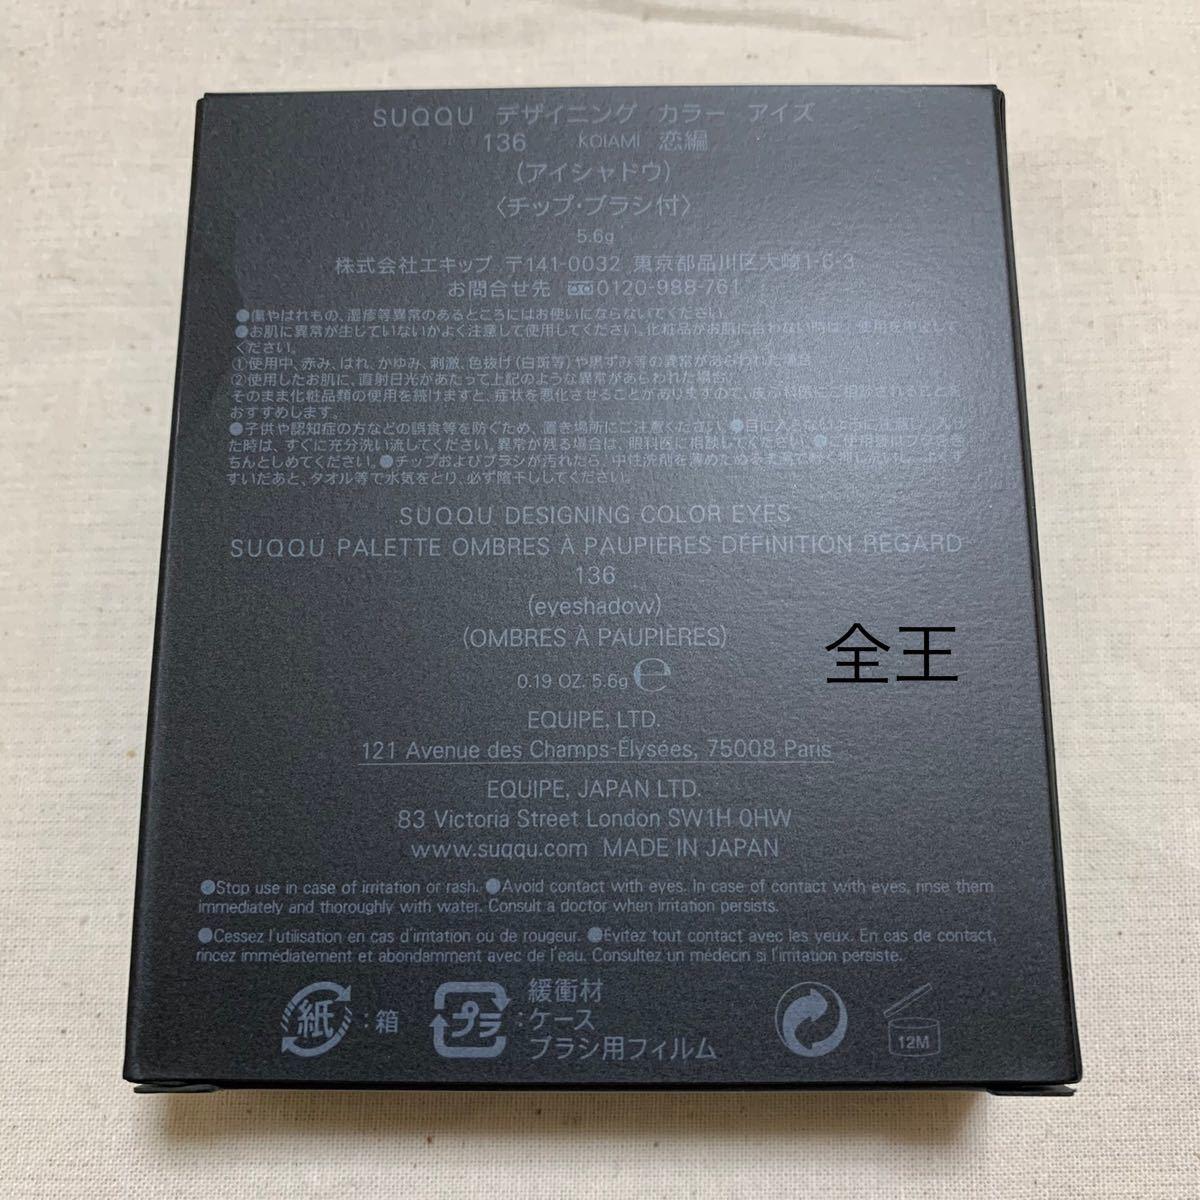 SUQQU 136 恋編 デザイニングカラーアイズ アイシャドウ